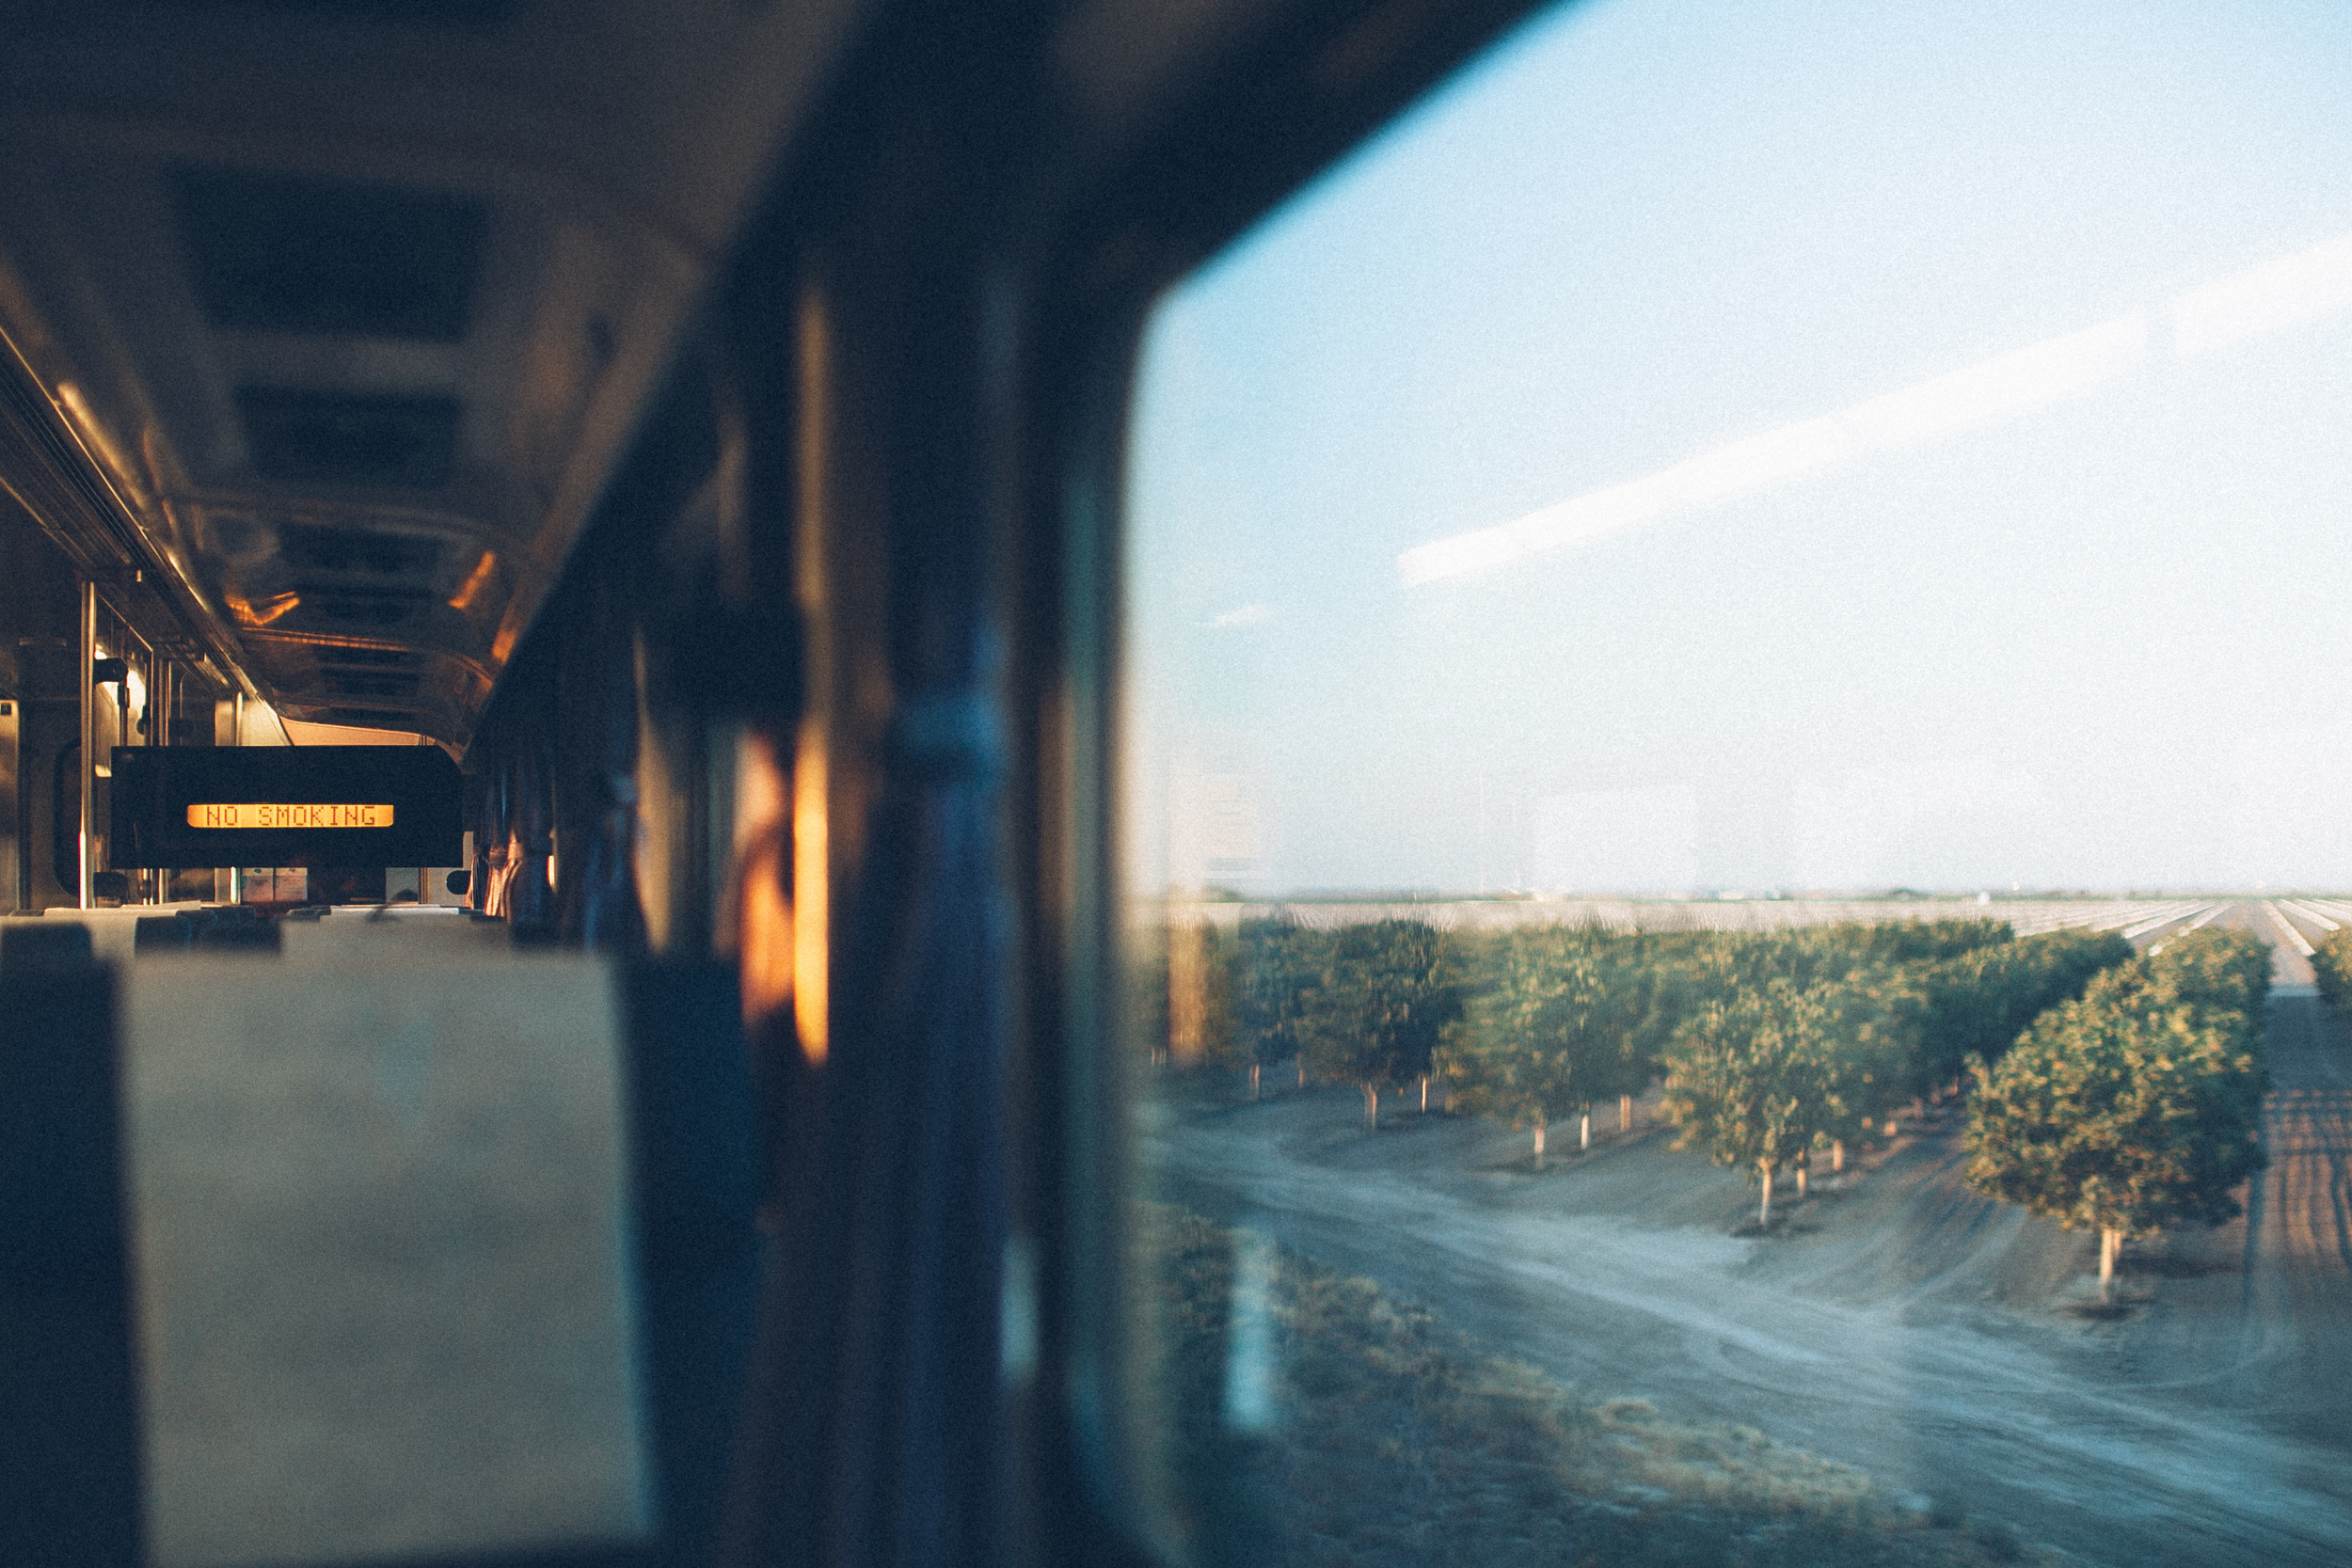 sanfrancisco-0944.jpg